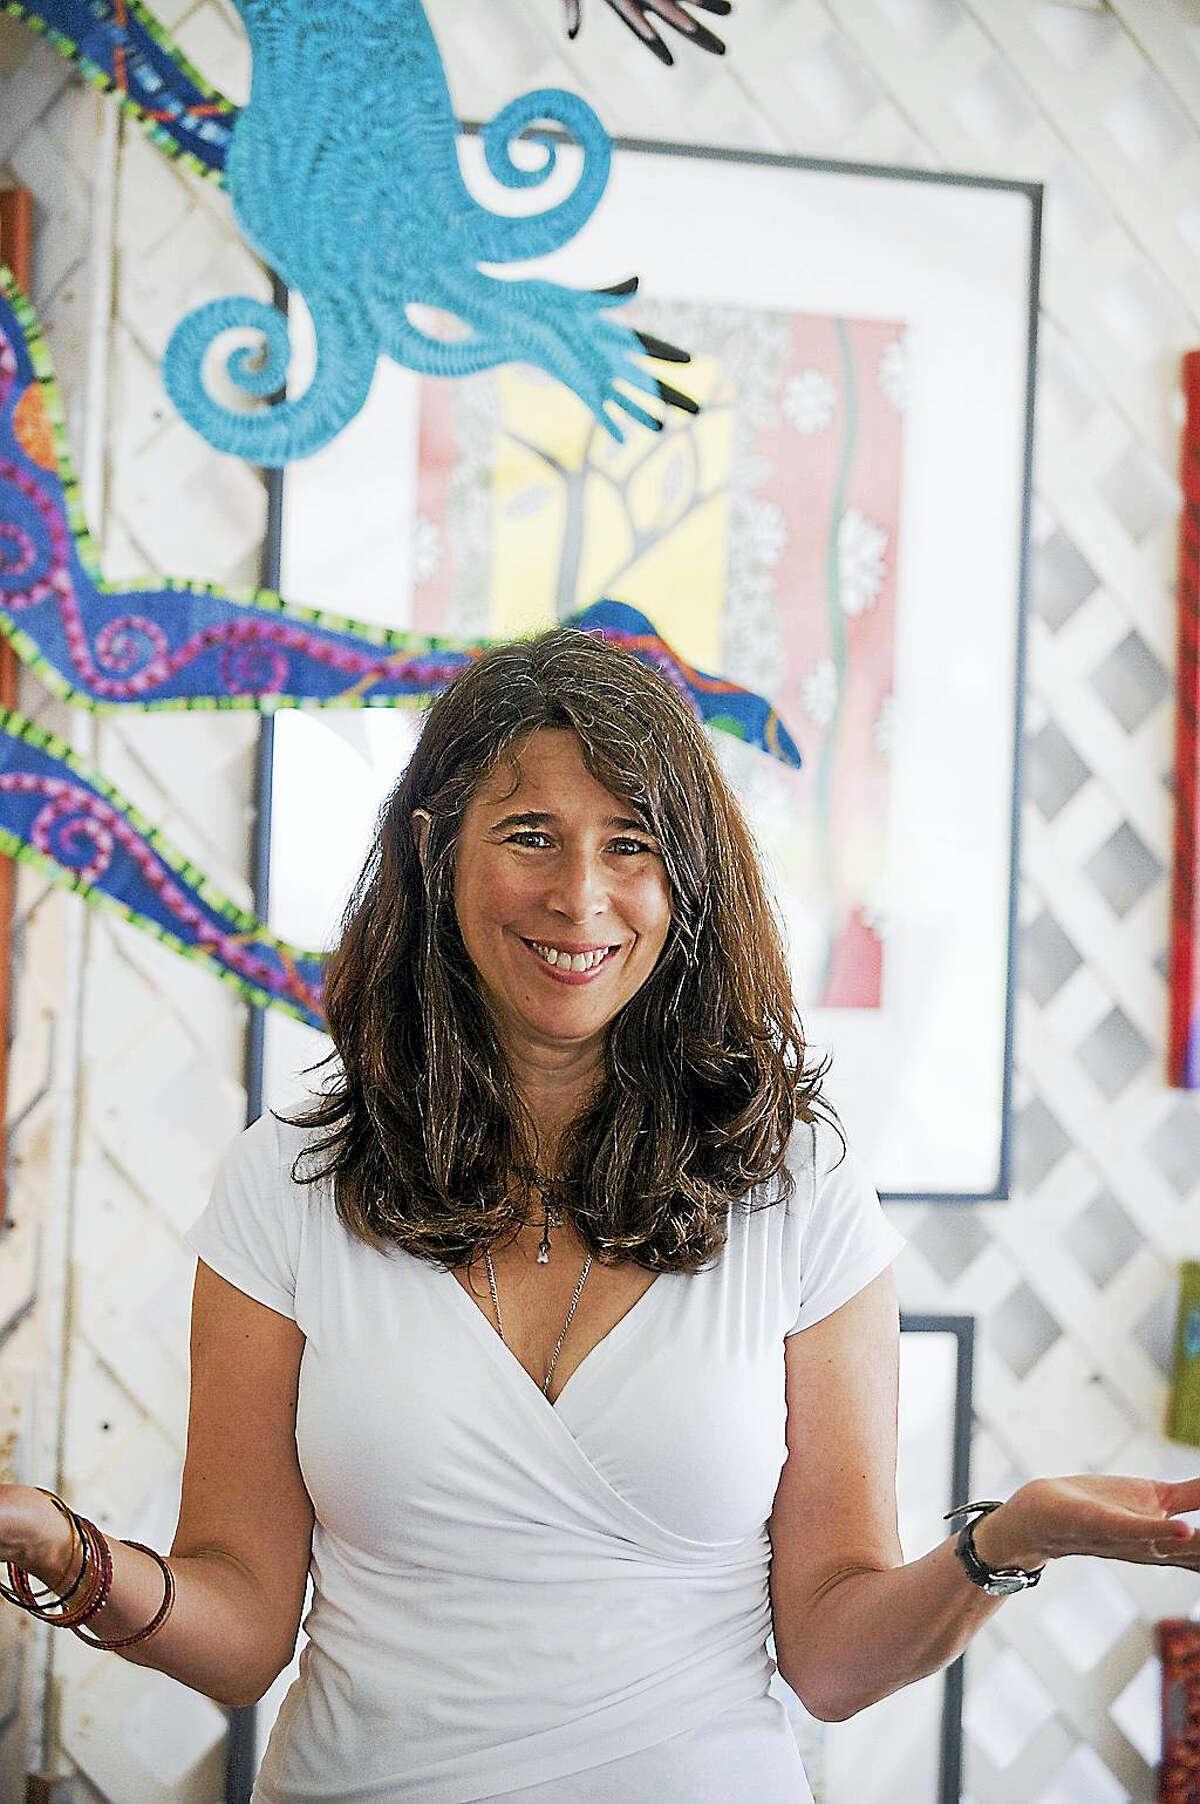 Artist Danielle Mailer is the Women's Forum of Litchfield's guest in April.